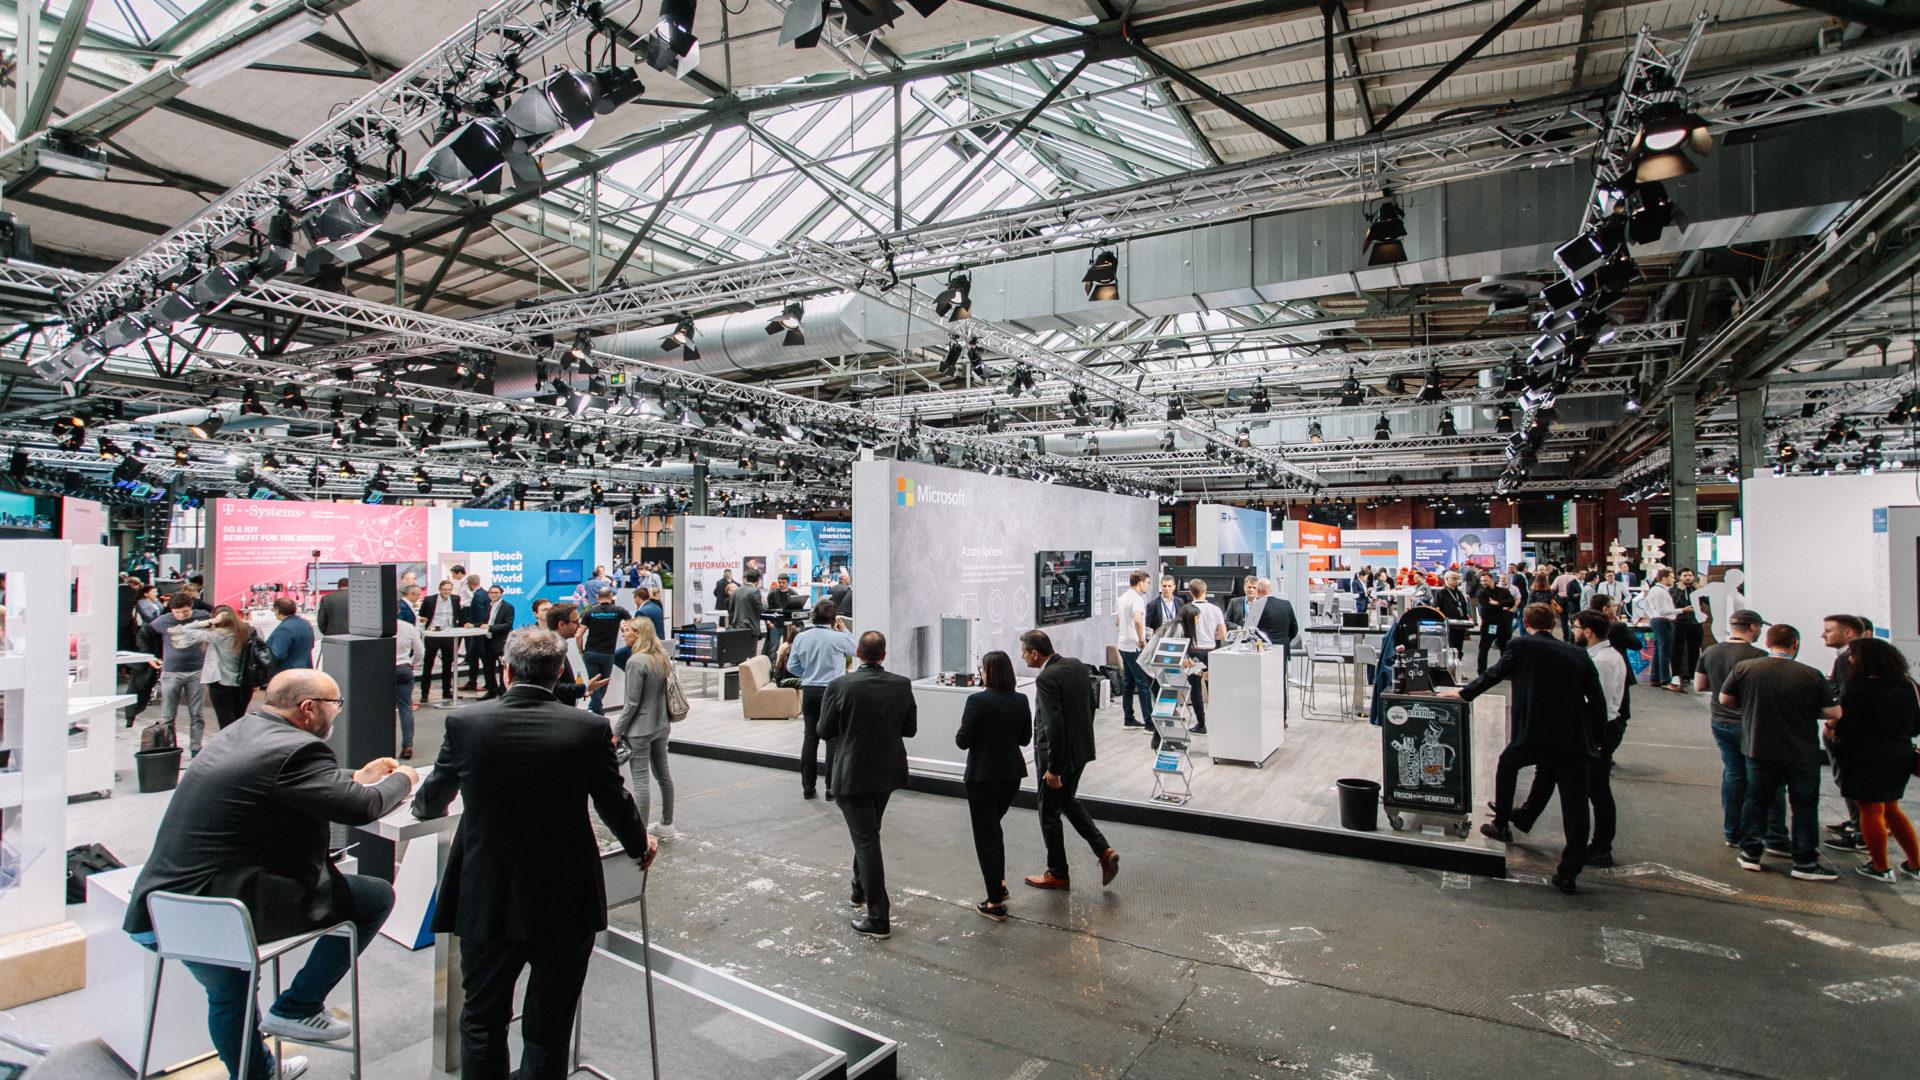 Bosch ConnectedWorld 2019, May 15-16 in Berlin